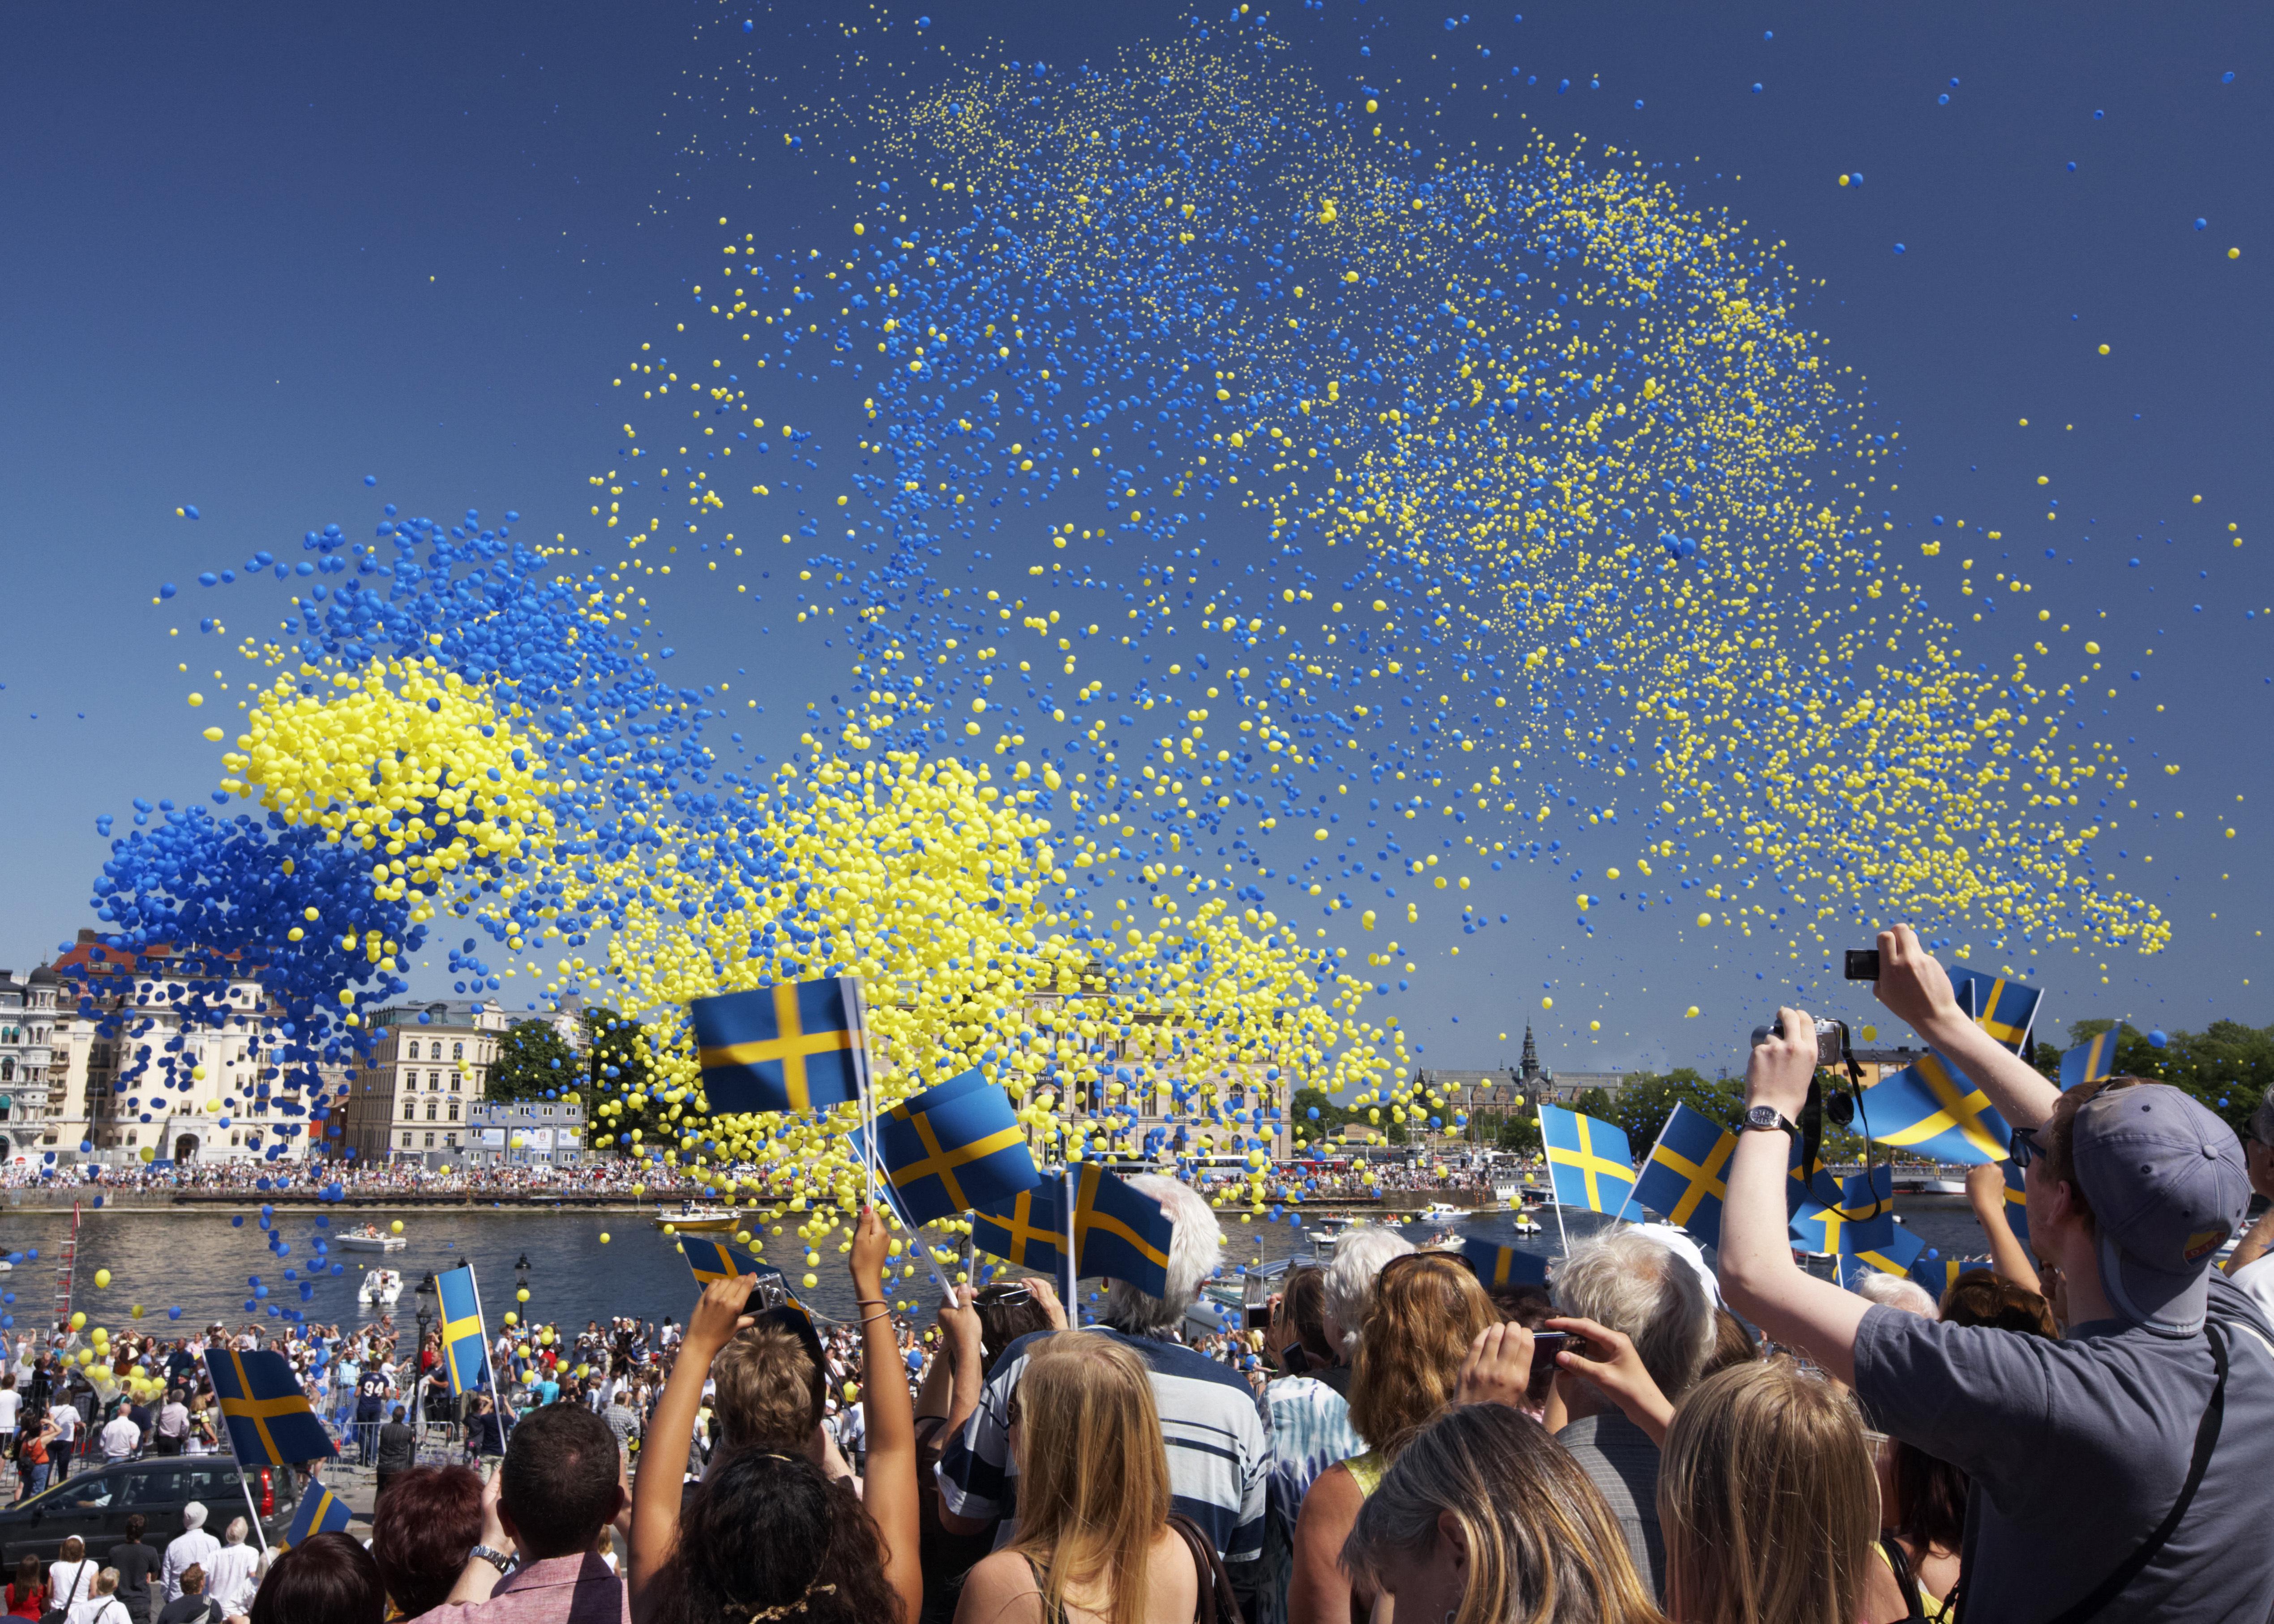 Credits Ola Ericson, imagebank.sweden.se